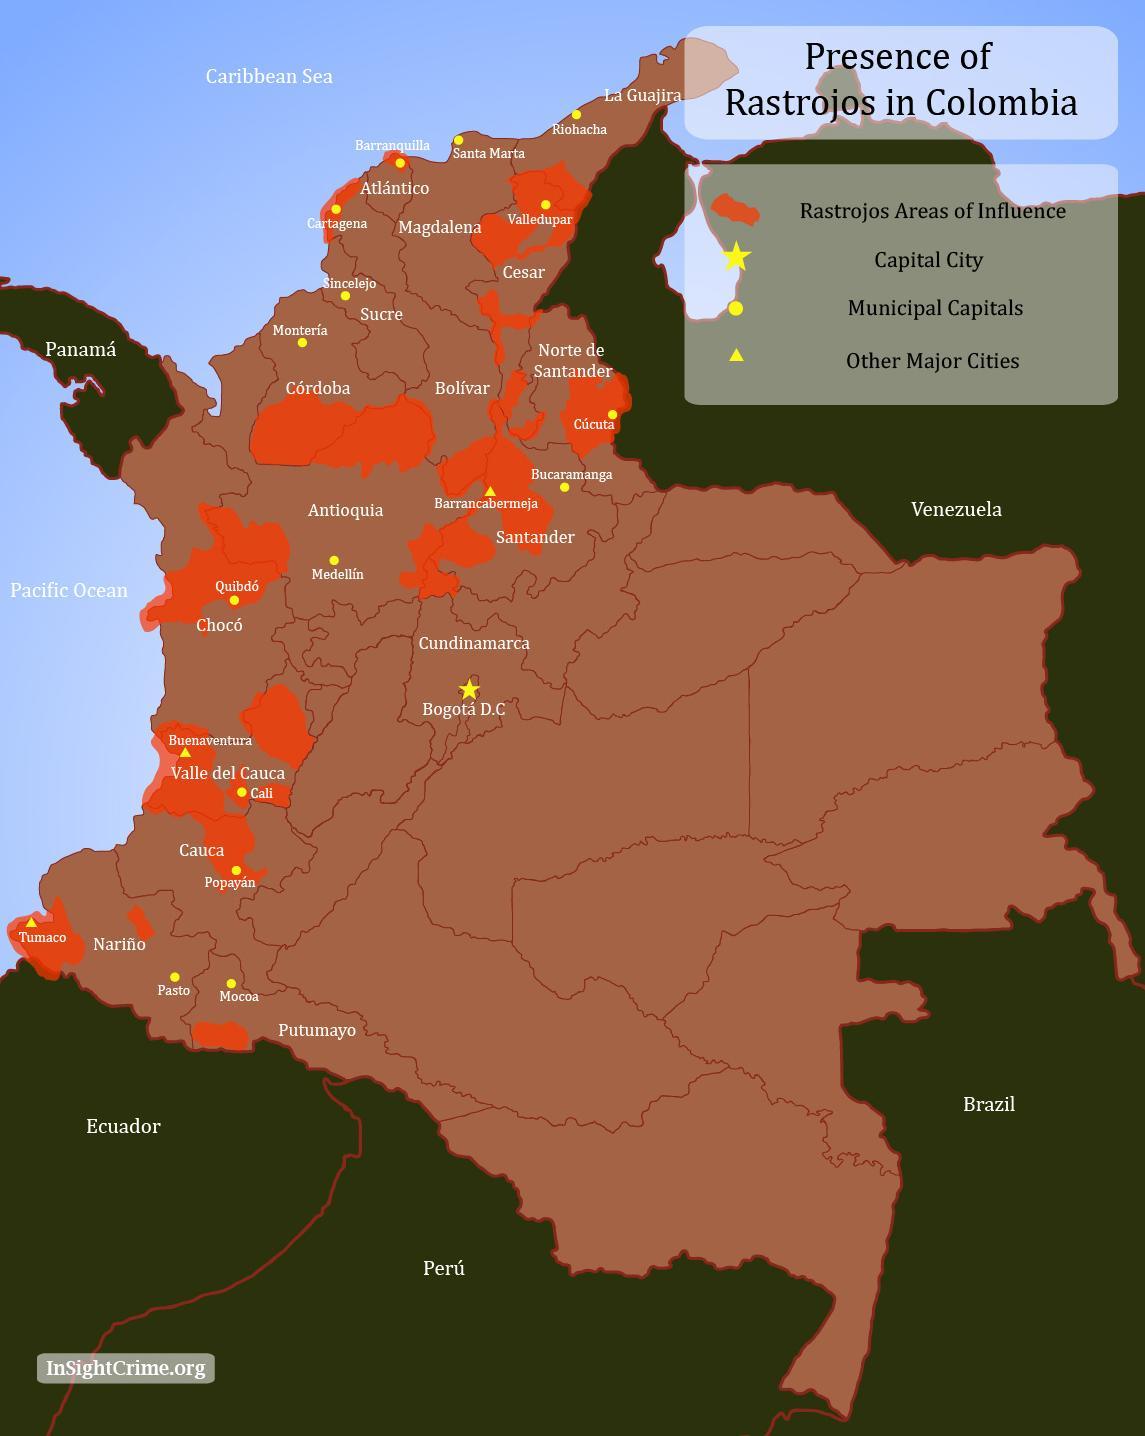 rastrojos_map_areasofinfluence